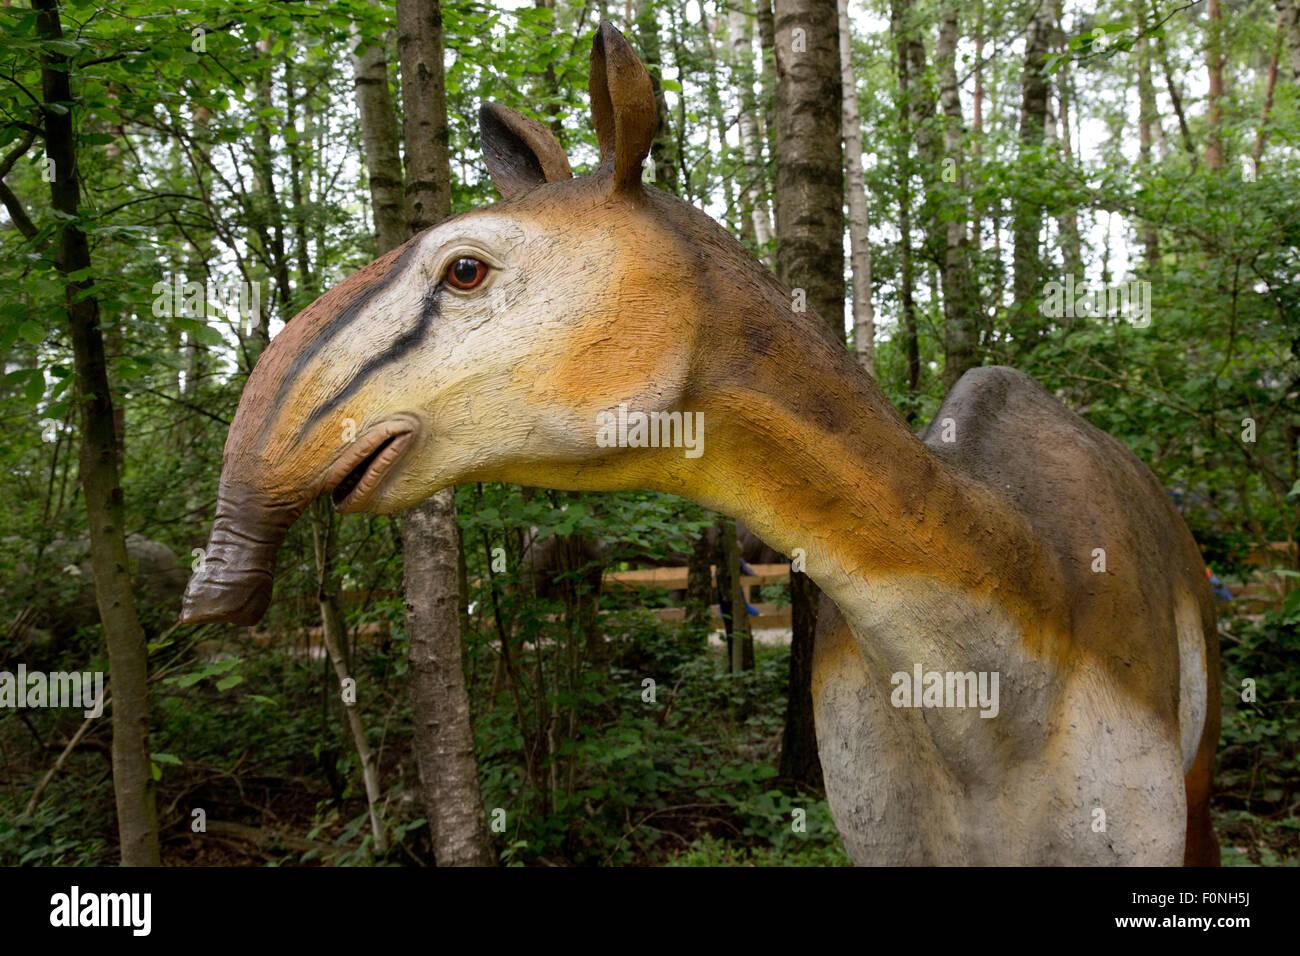 Macrauchenia long-necked extinct three-toed South American ungulate mammal Dinosaurier Park Germany - Stock Image